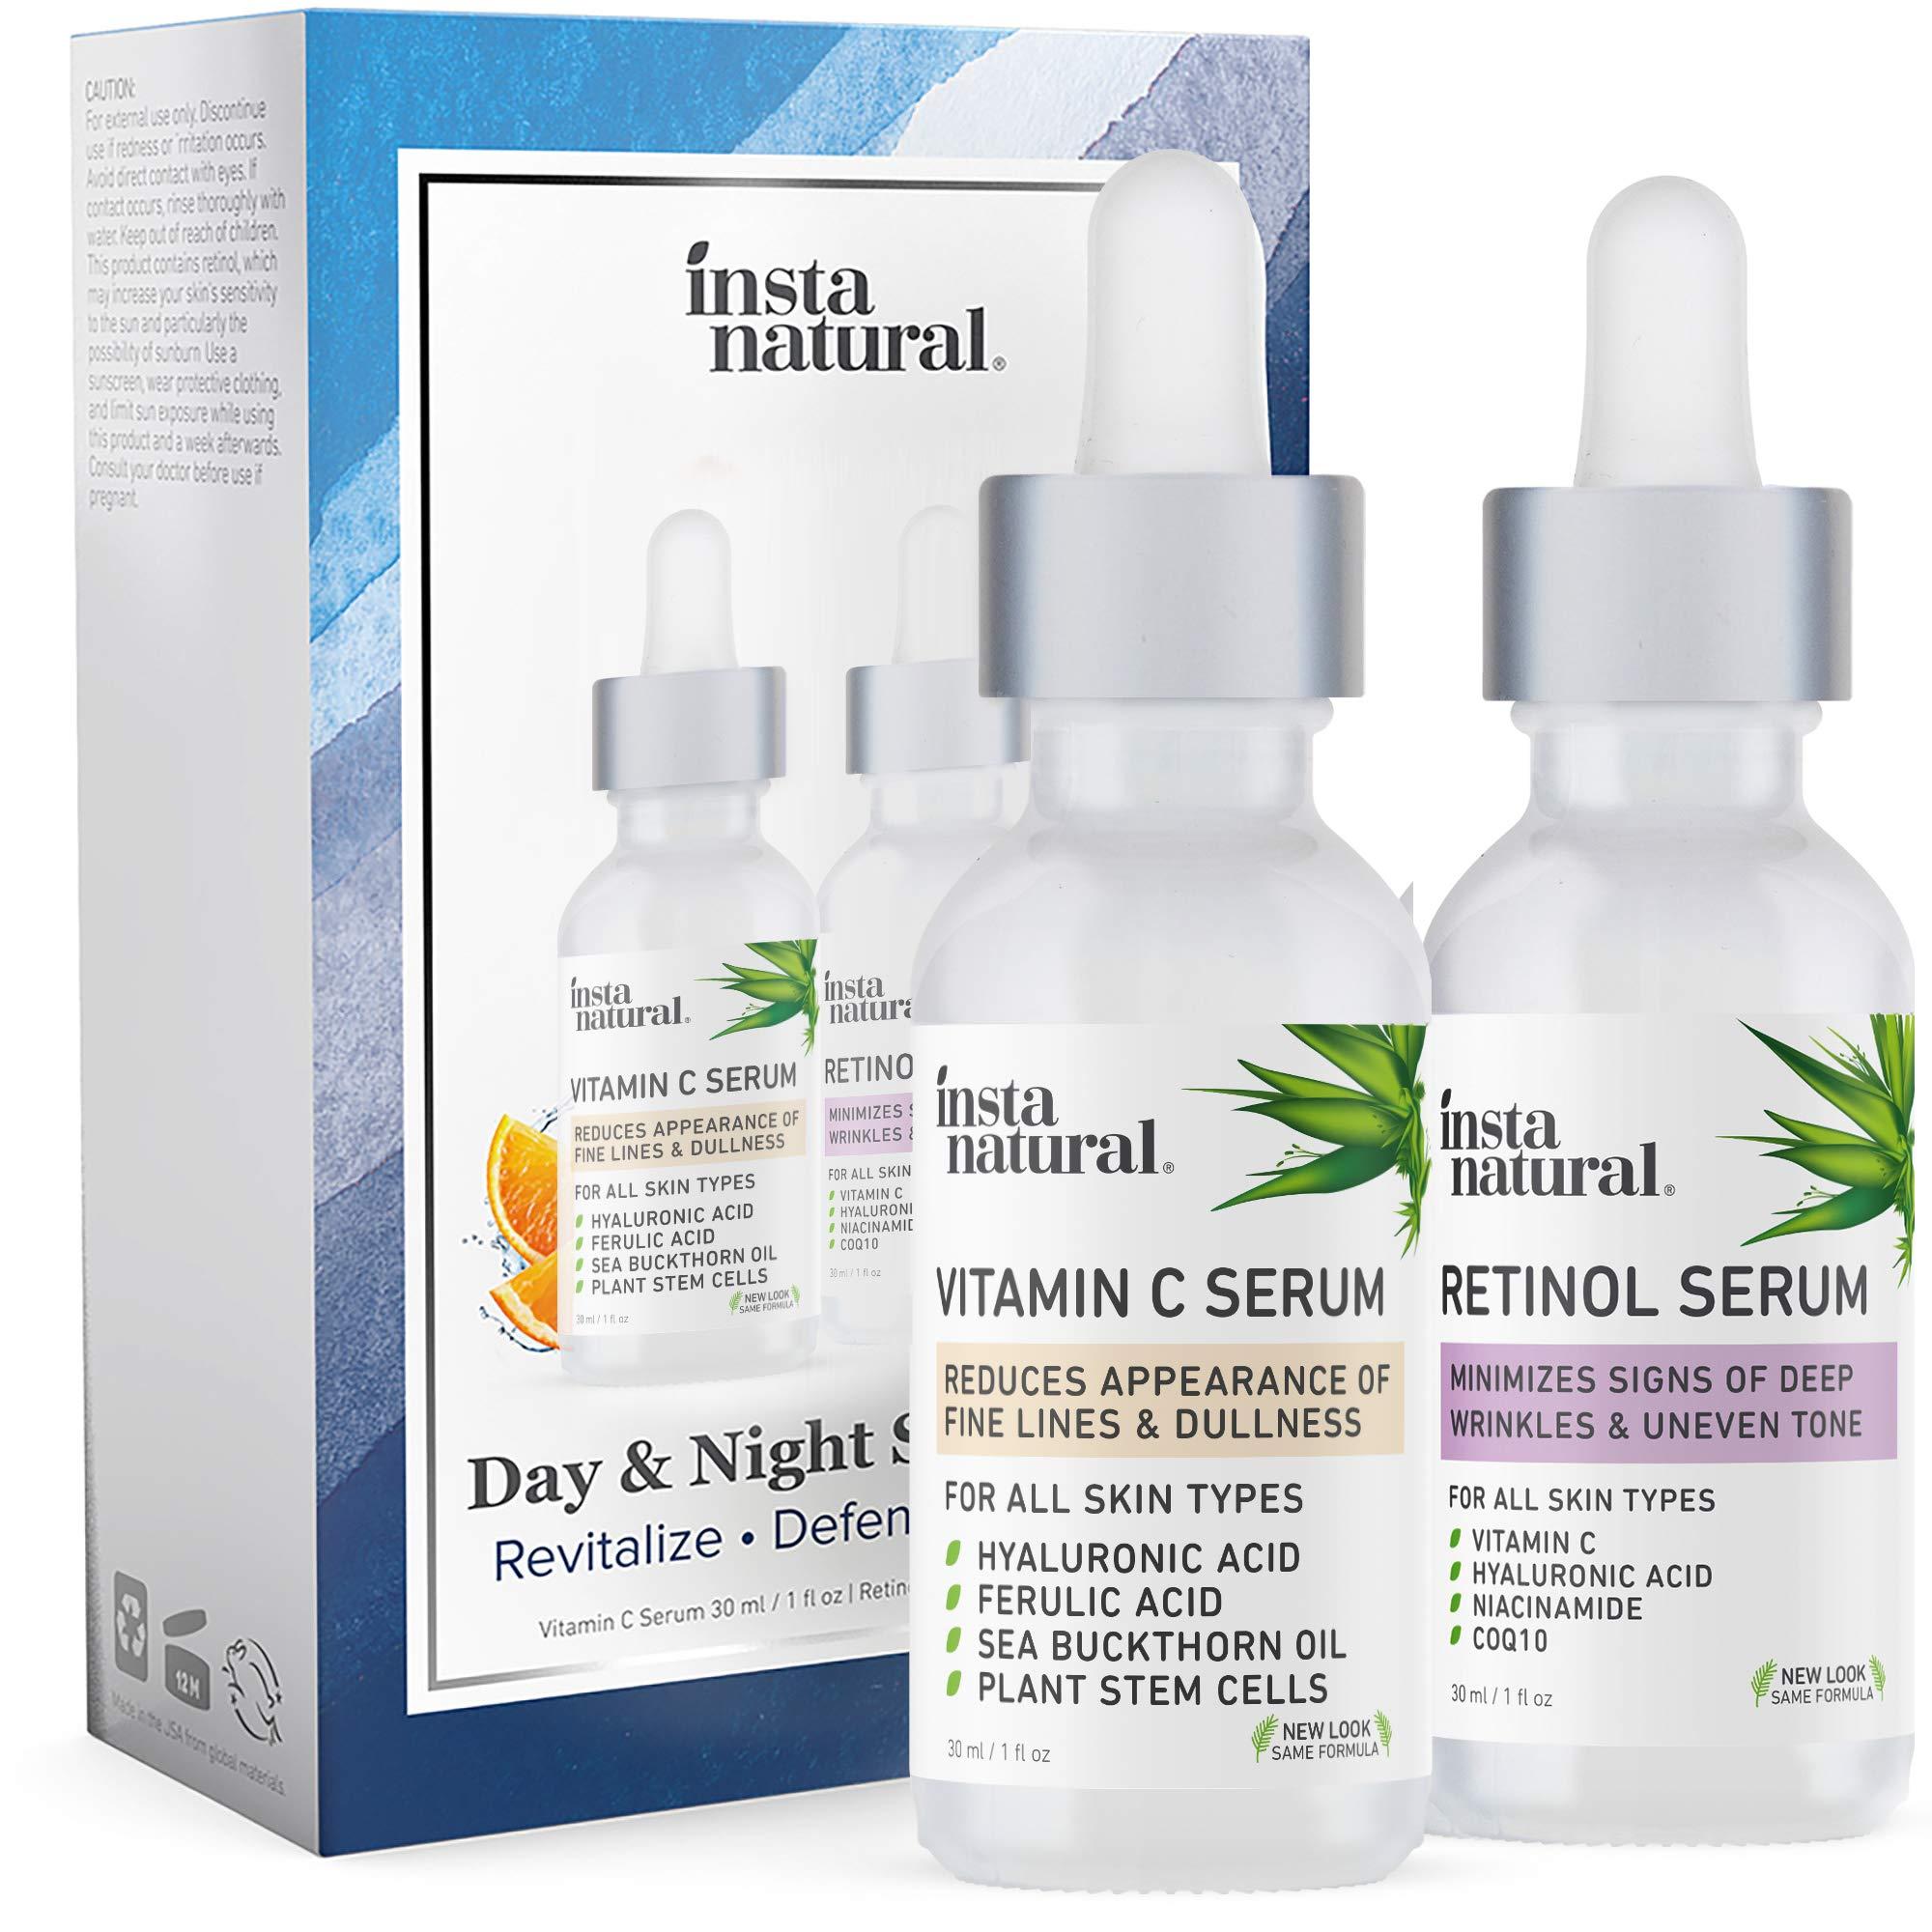 Day & Night Duo Facial Serum Bundle - Vitamin C Serum & Retinol Serum - Natural & Organic Anti Aging Formula for Face - Improve Skin Texture & Glow - Reduce Fine Lines Dark Spots Hyperpigmentation - InstaNatural